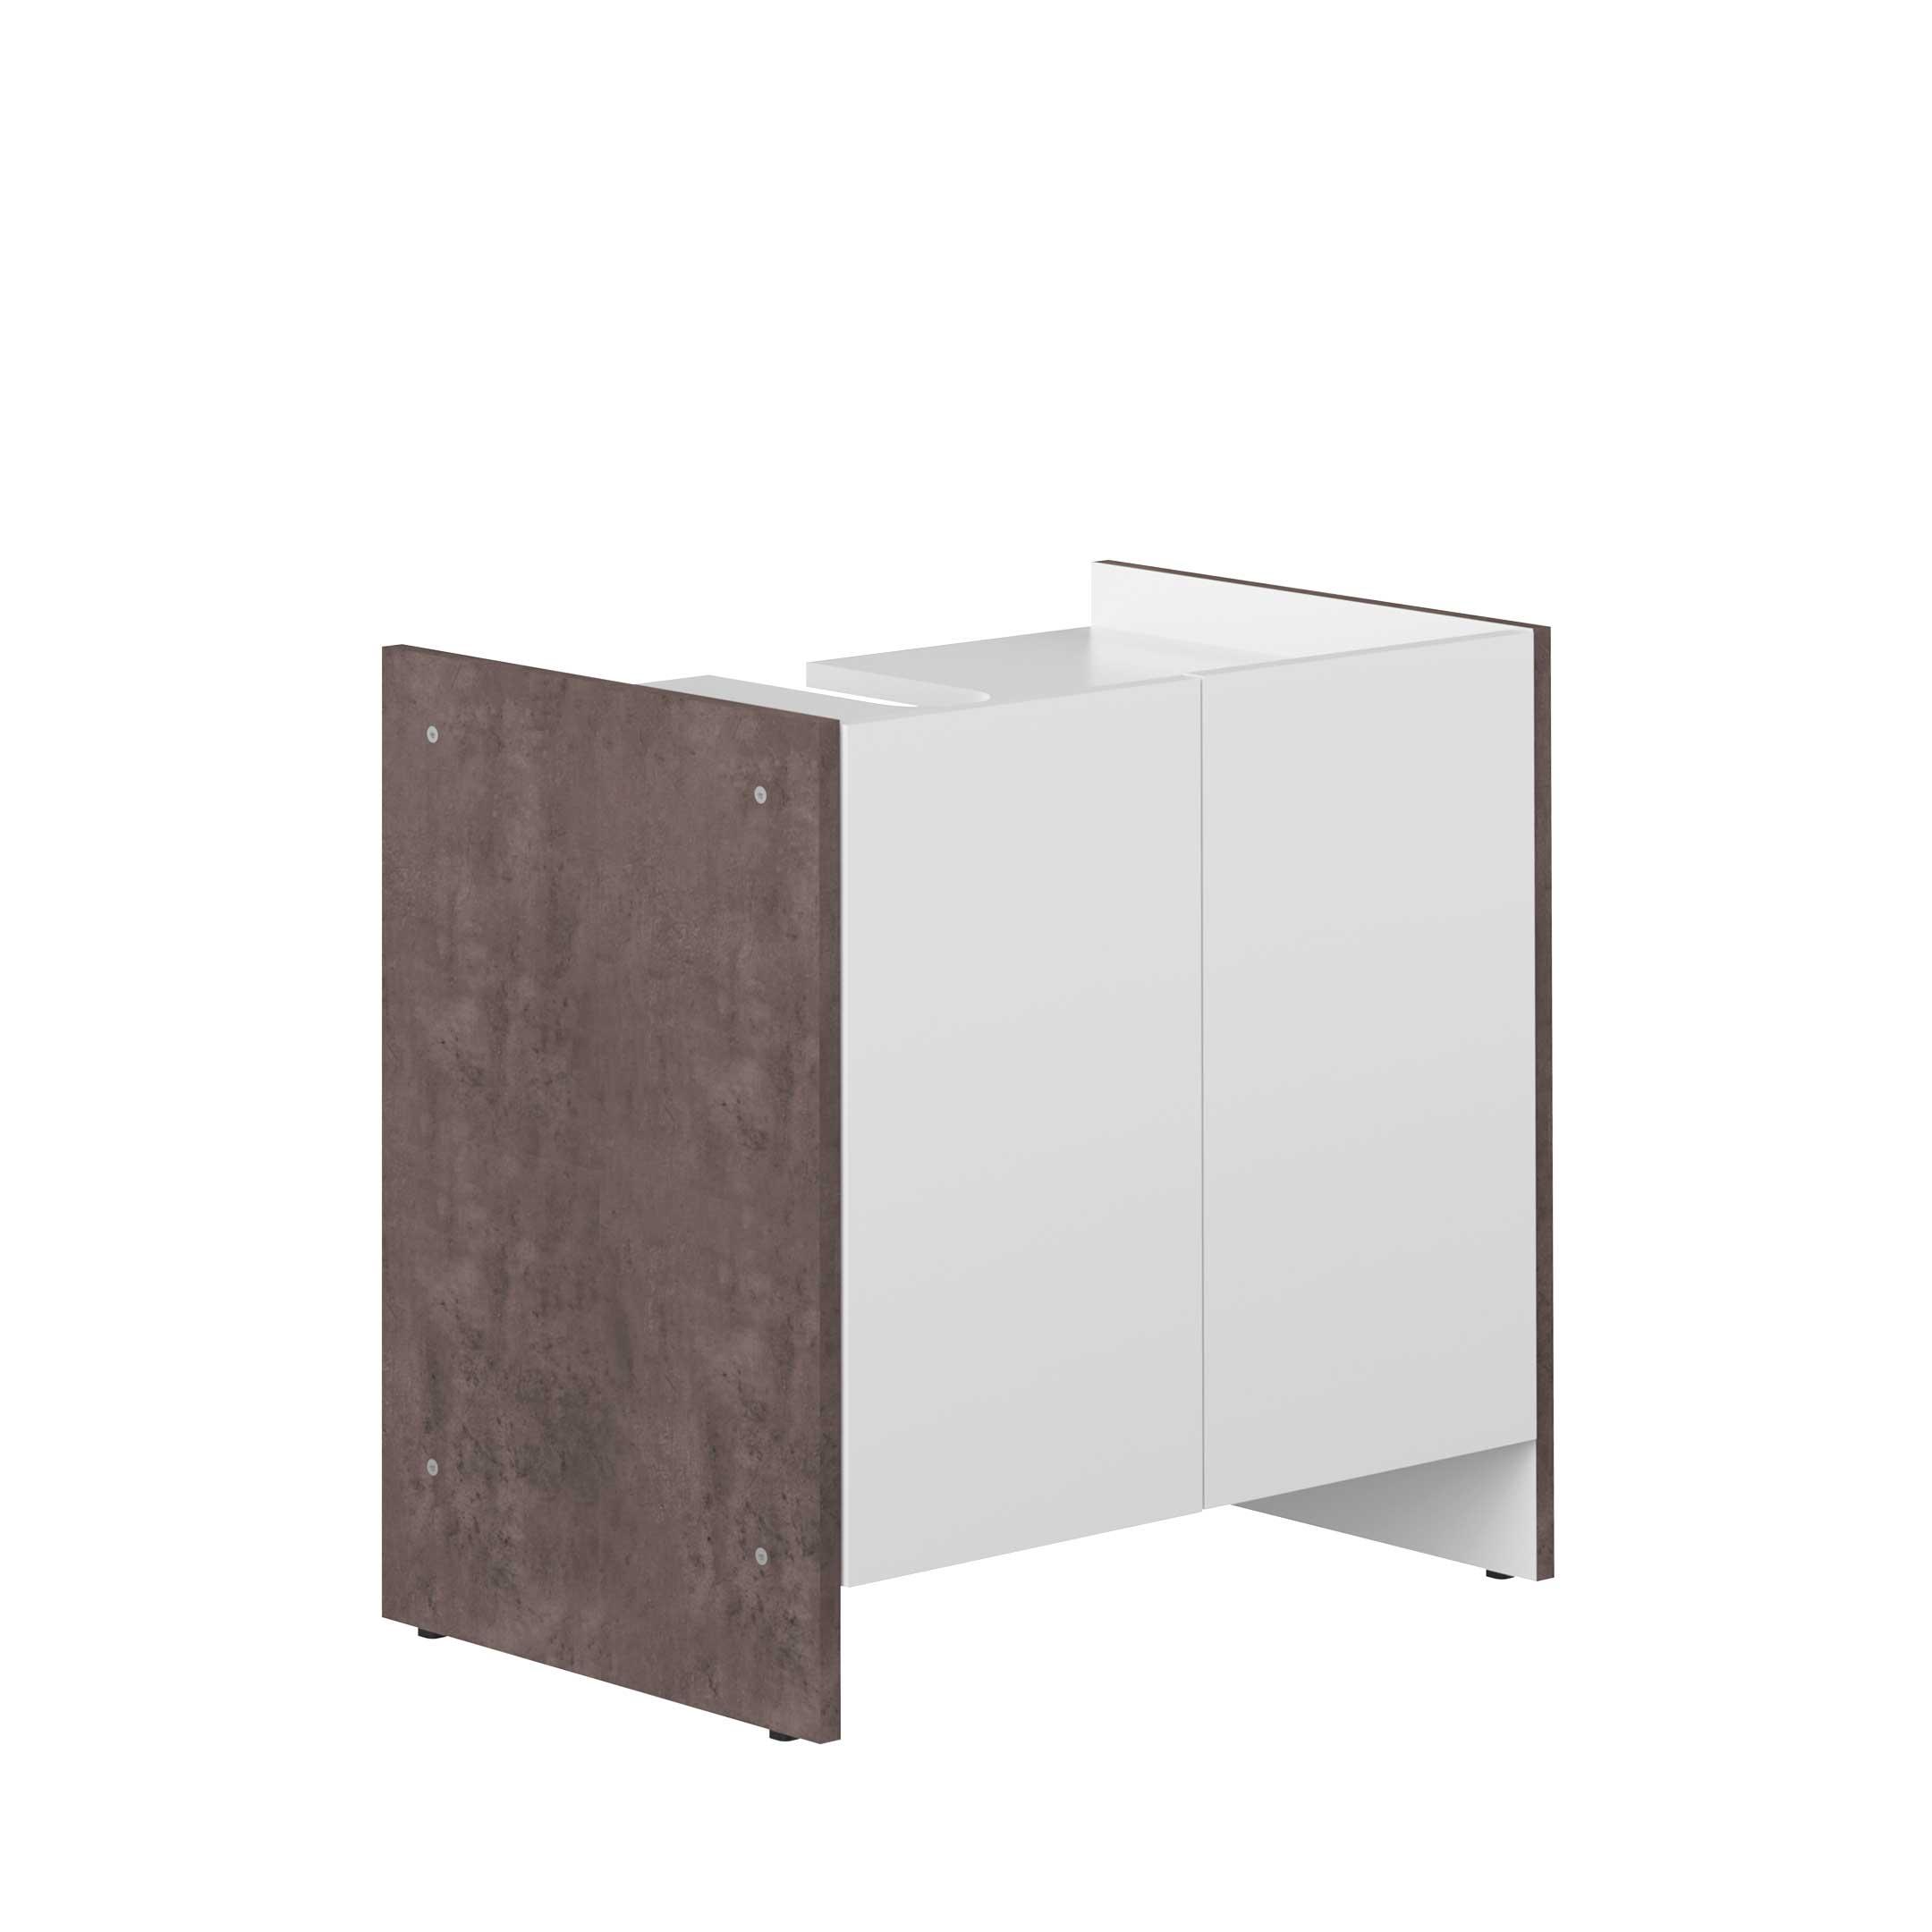 Wastafelkastje Biarritz wit beton